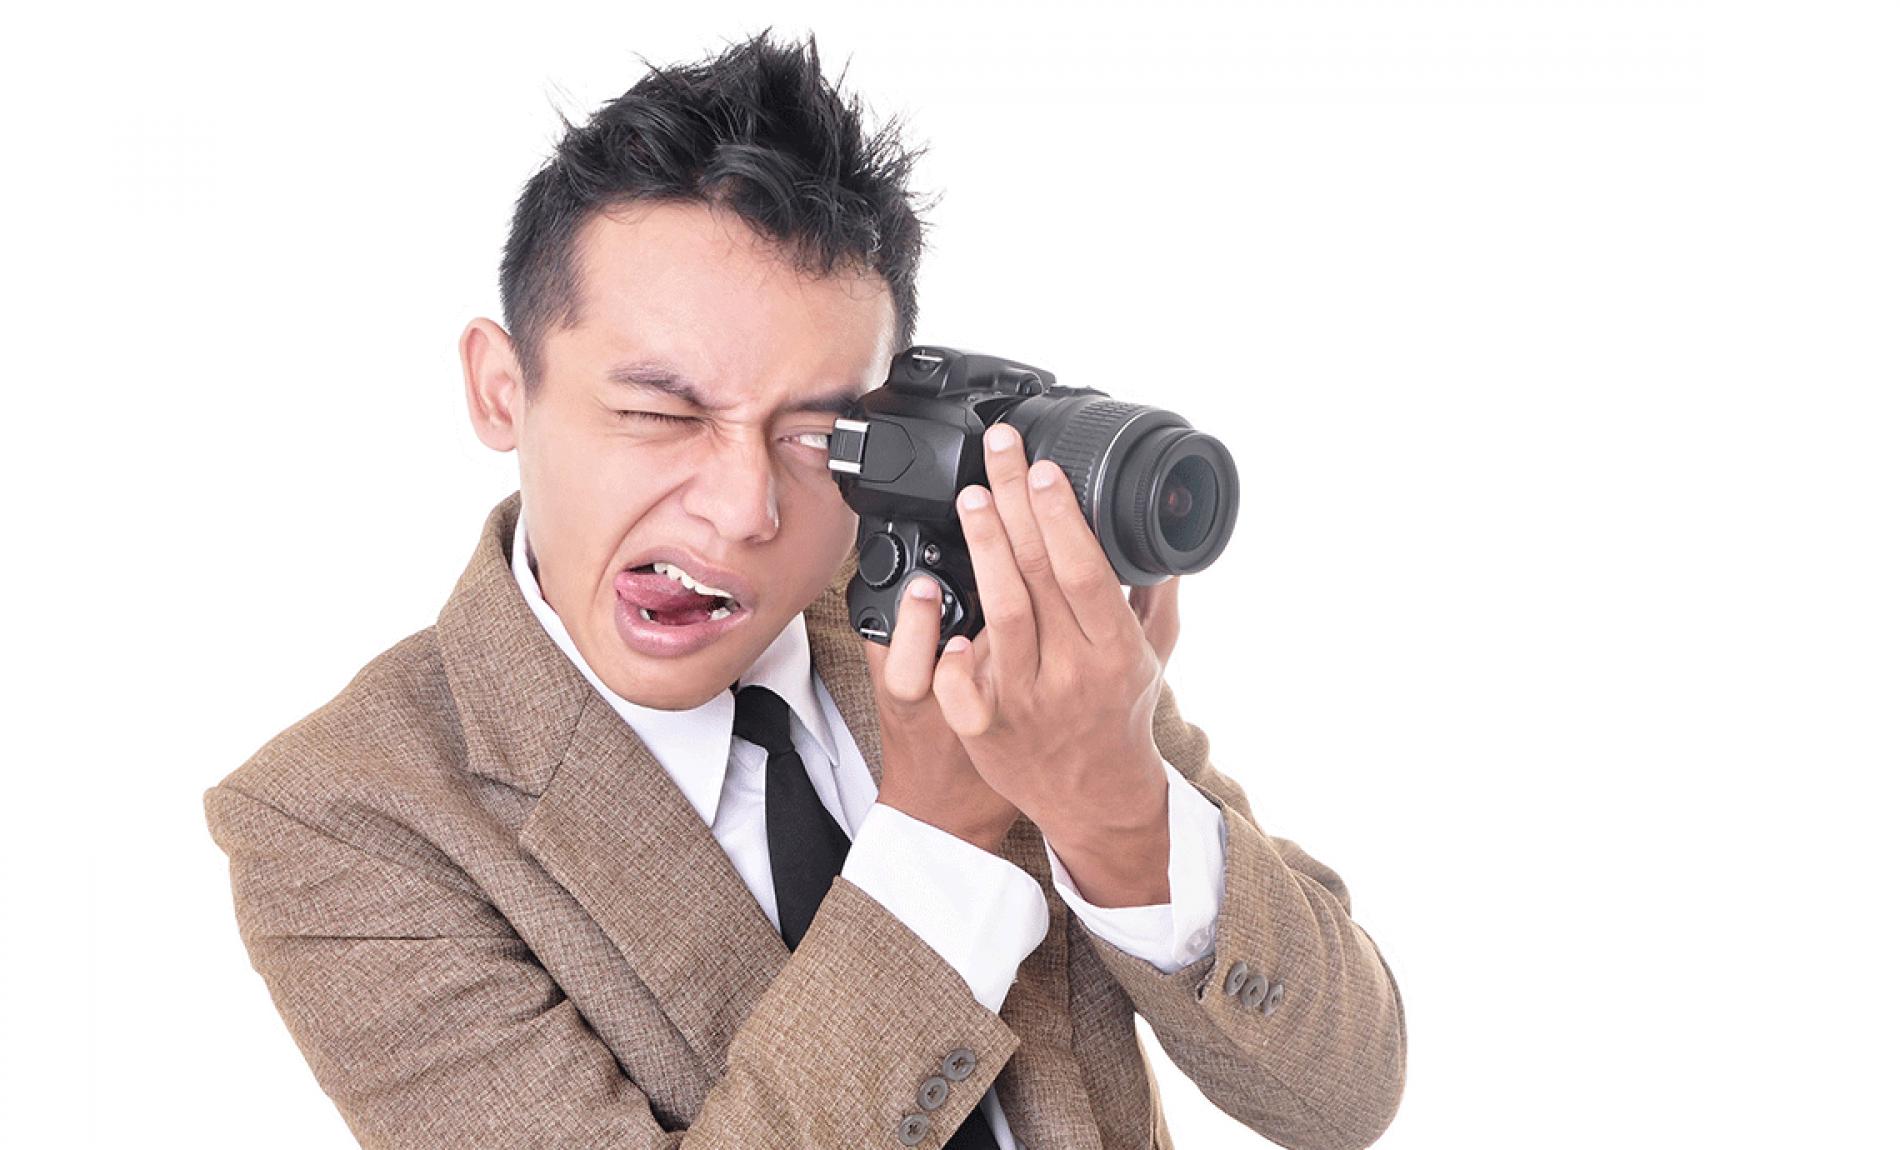 State lontano dai fotografi incapaci!